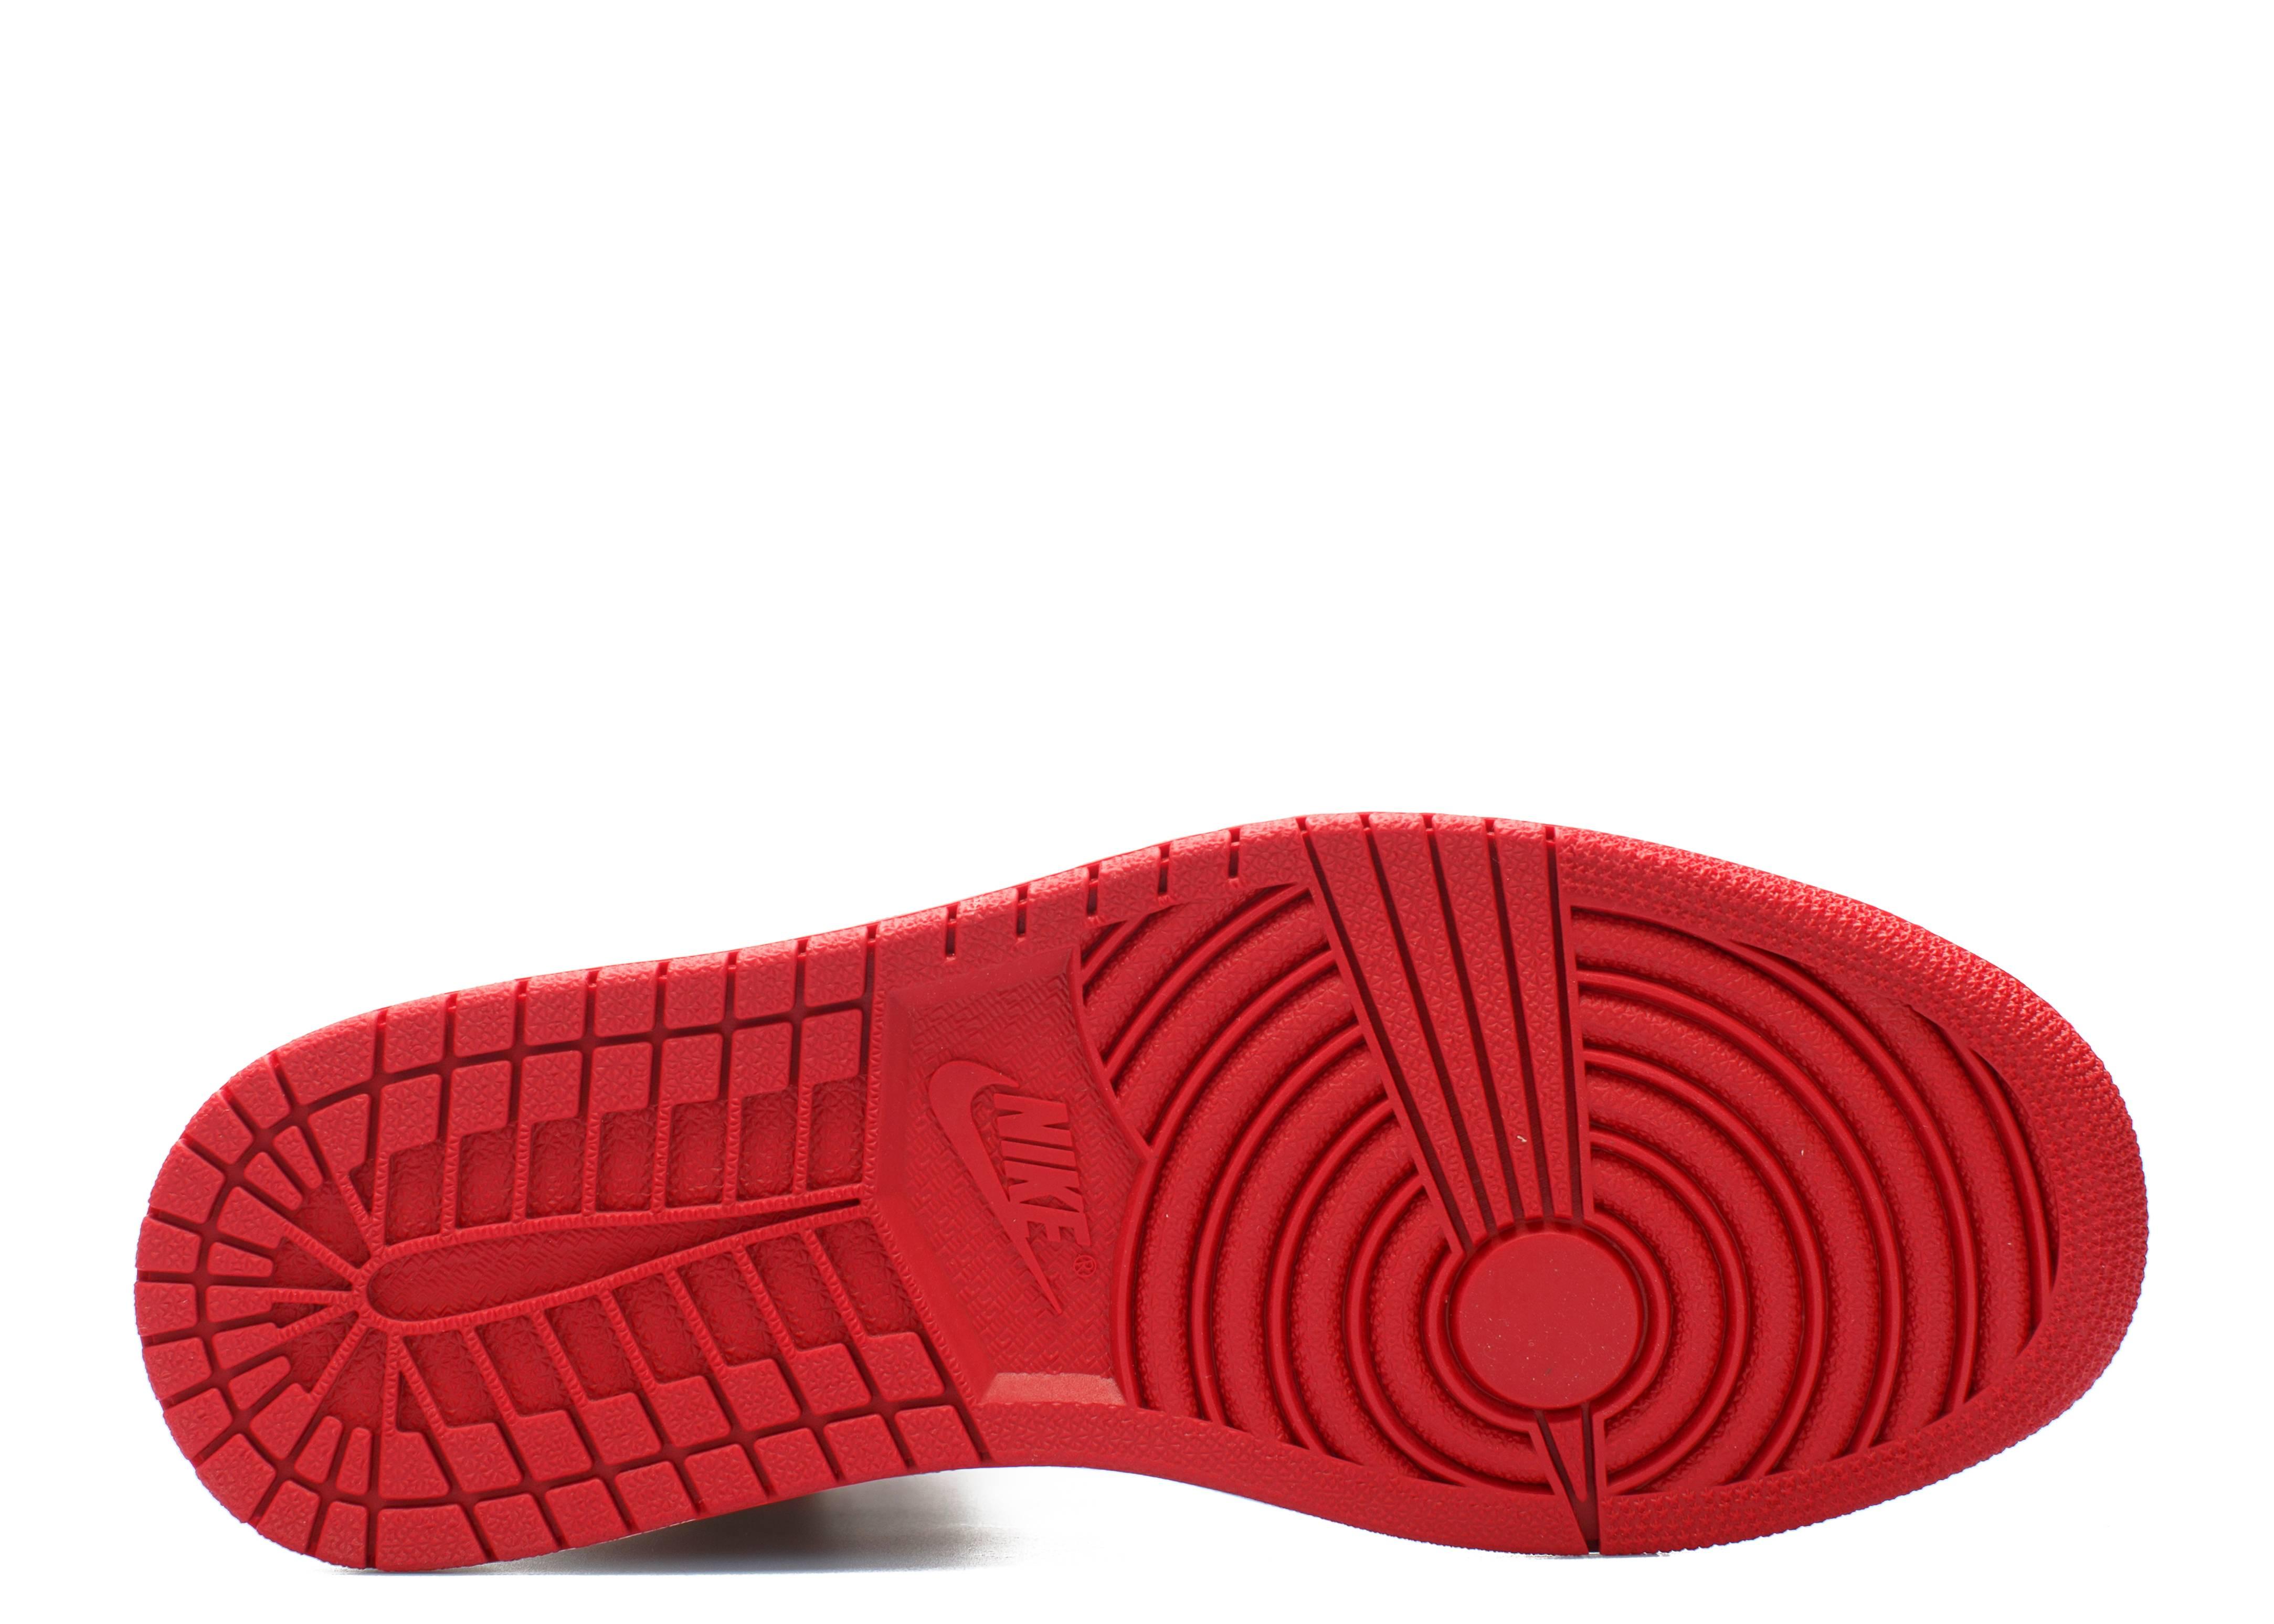 lowest price f569a 8b90b Air Jordan 1 Retro High Og